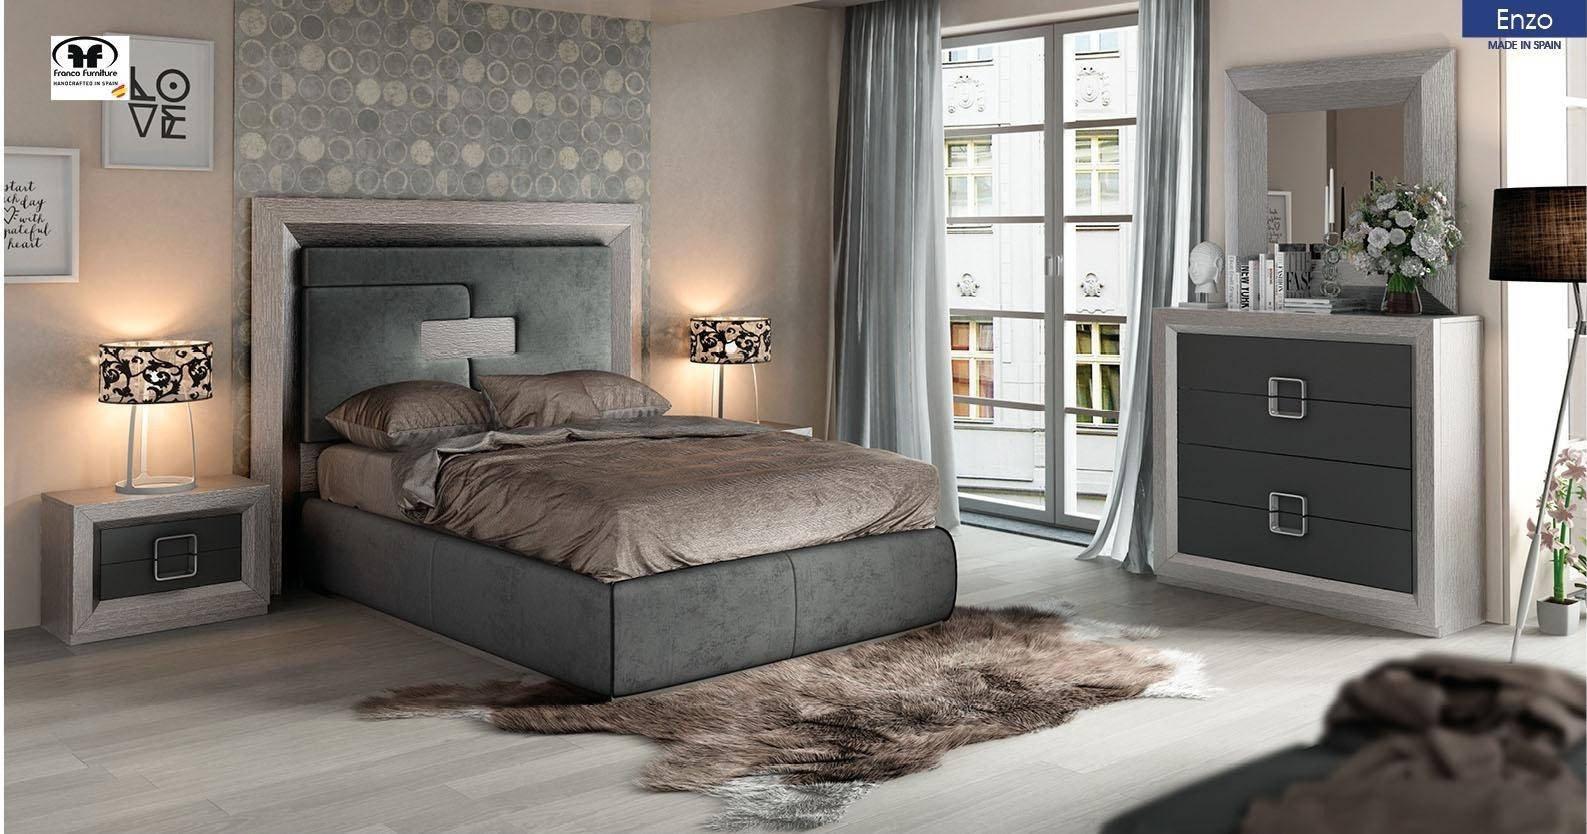 Gray King Bedroom Set Fresh Esf Enzo King Platform Bedroom Set 5 Pcs In Gray Fabric